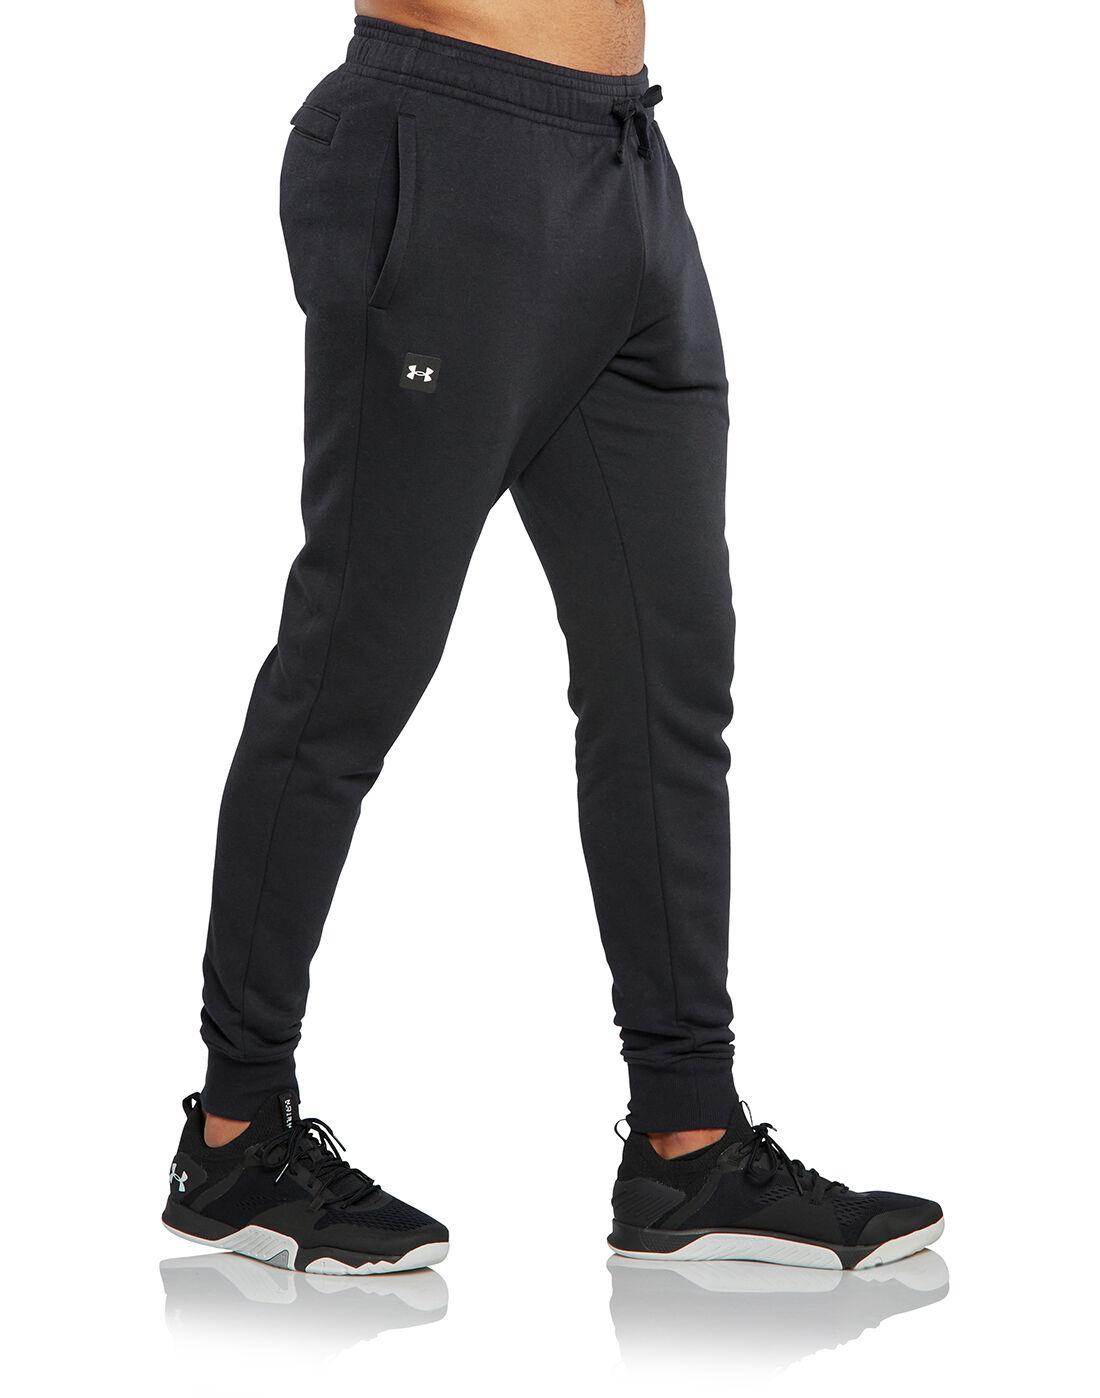 Under Armour selena gomez adidas neo fashion line shoes 2016   Mens Rival Fleece Joggers